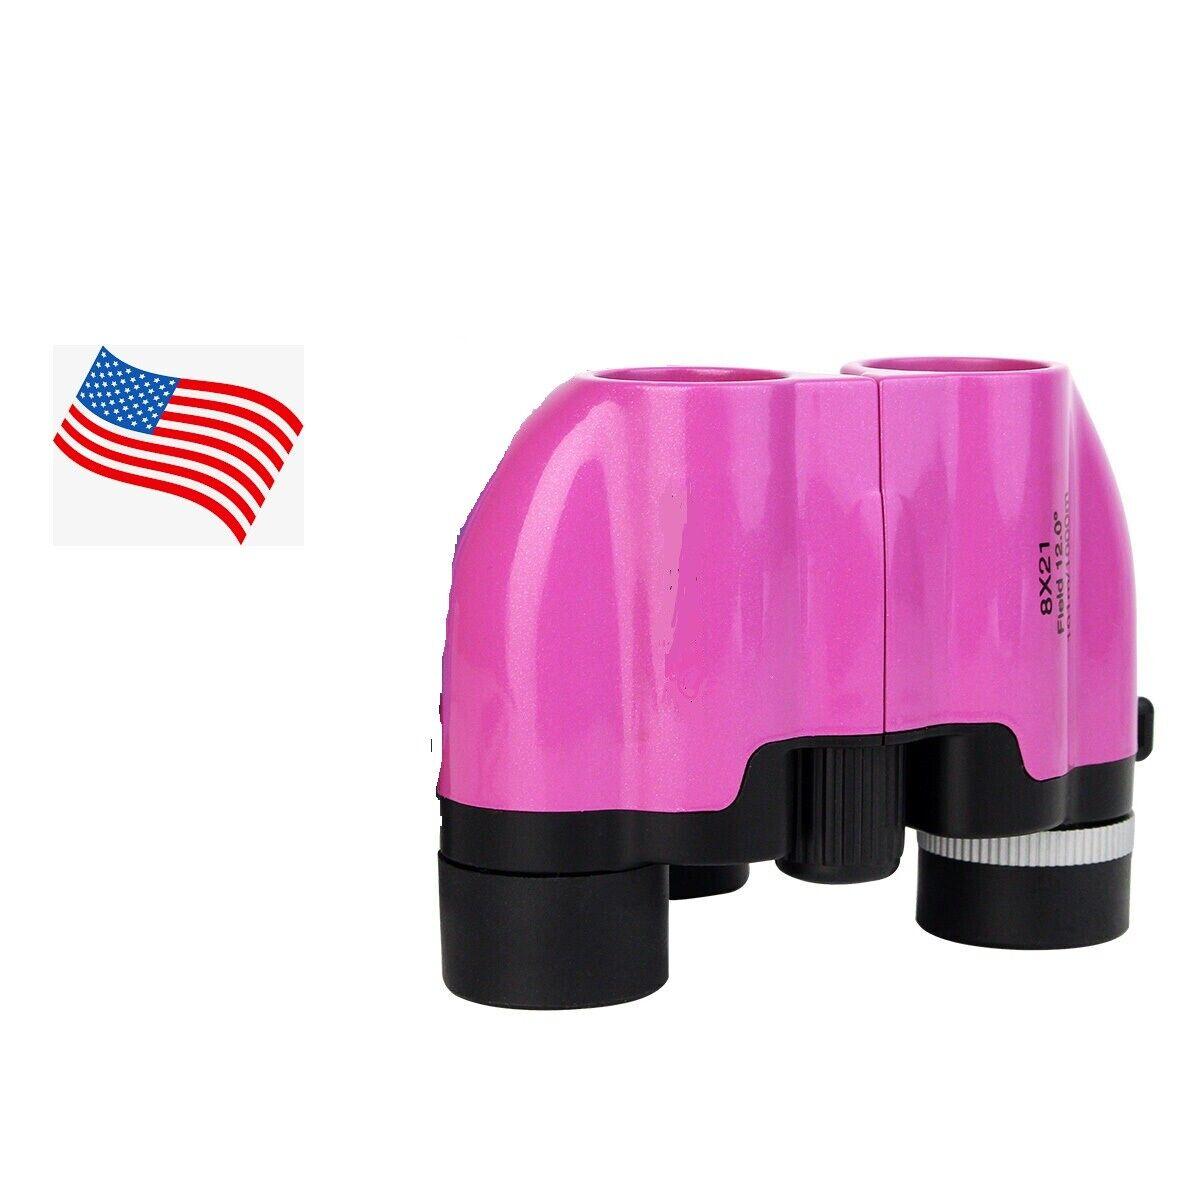 Mini Portable Day/Night 8×21 Zoom Binoculars Optics Hunting Camping US Pink Binoculars & Monoculars